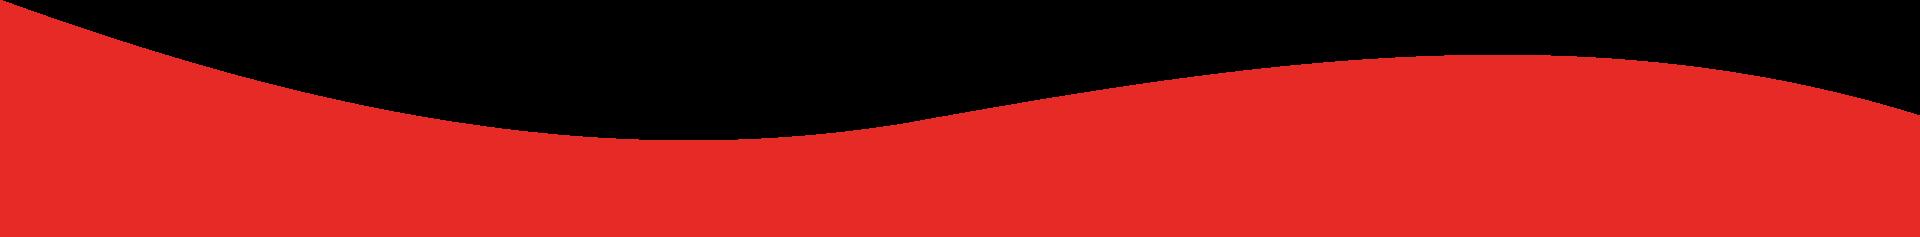 balkrood-boven-evelo